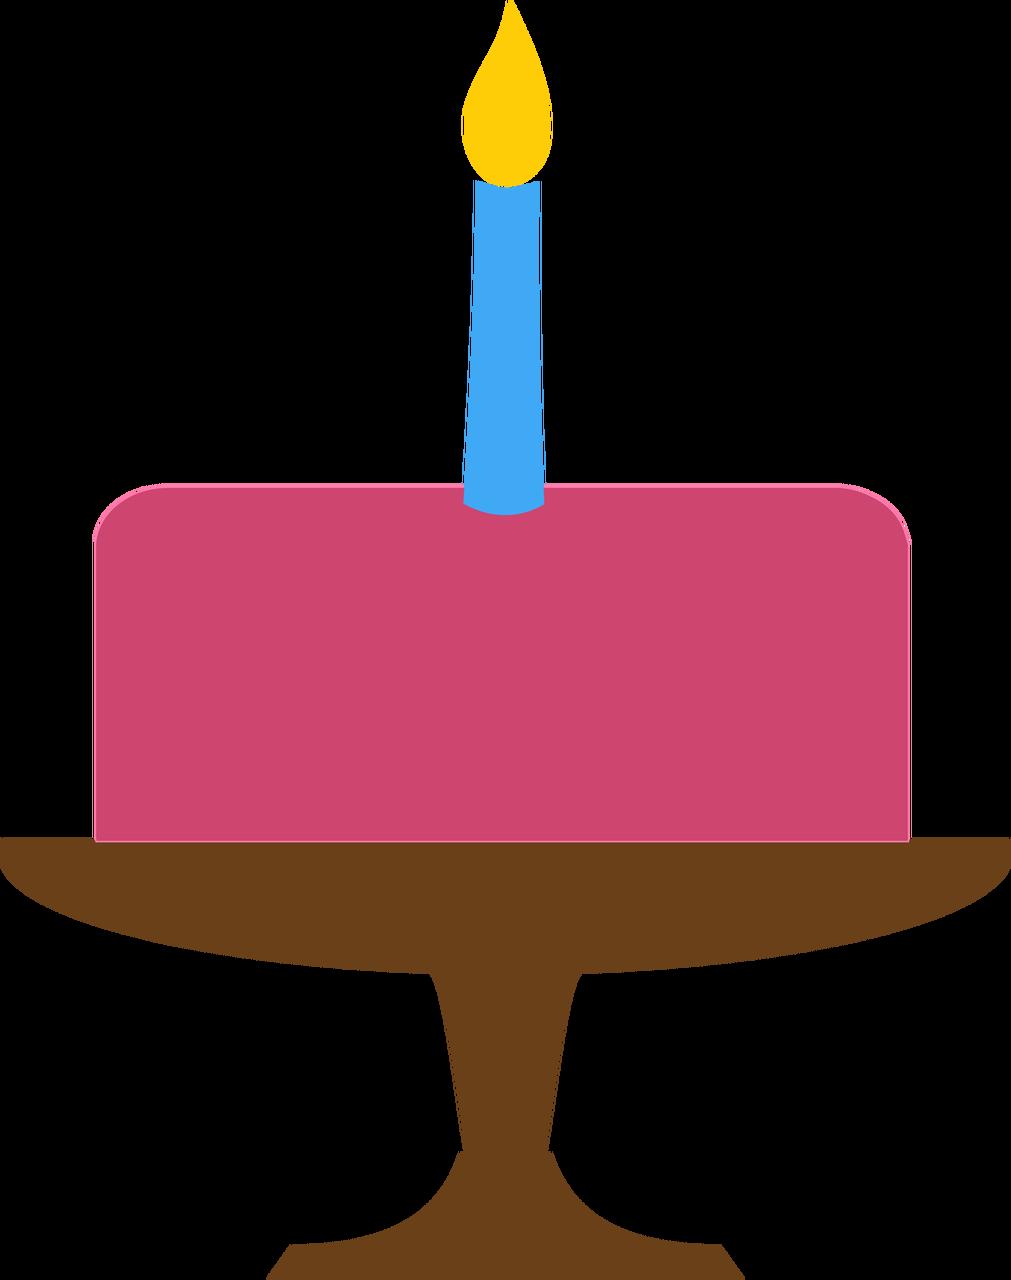 Birthday Cake #3 SVG Cut File